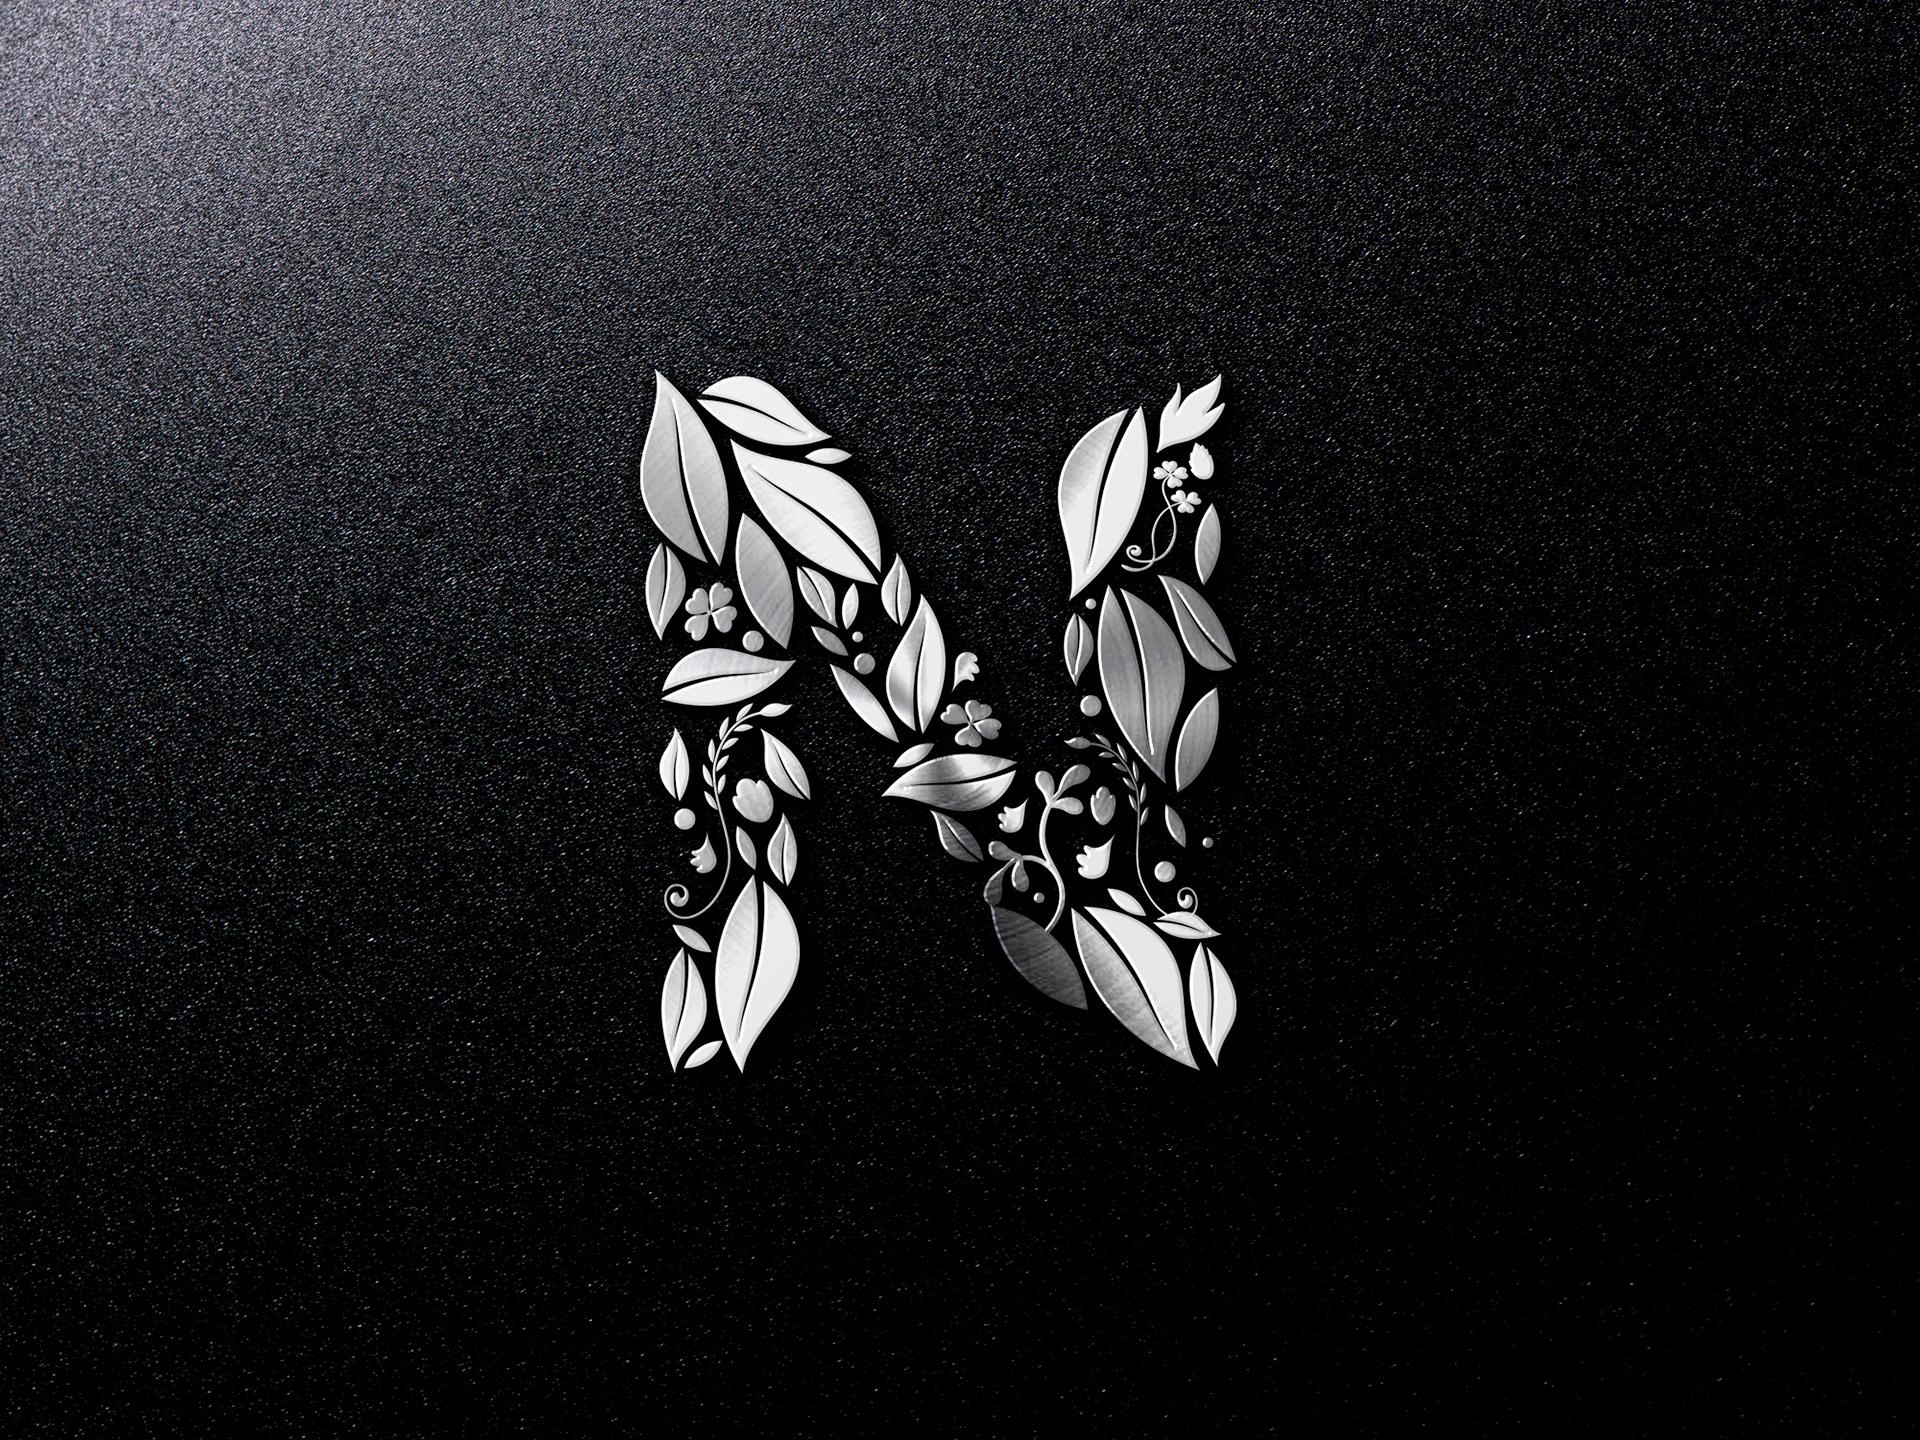 Hd Wallpaper Letter N: Logo Design (Logo設計)